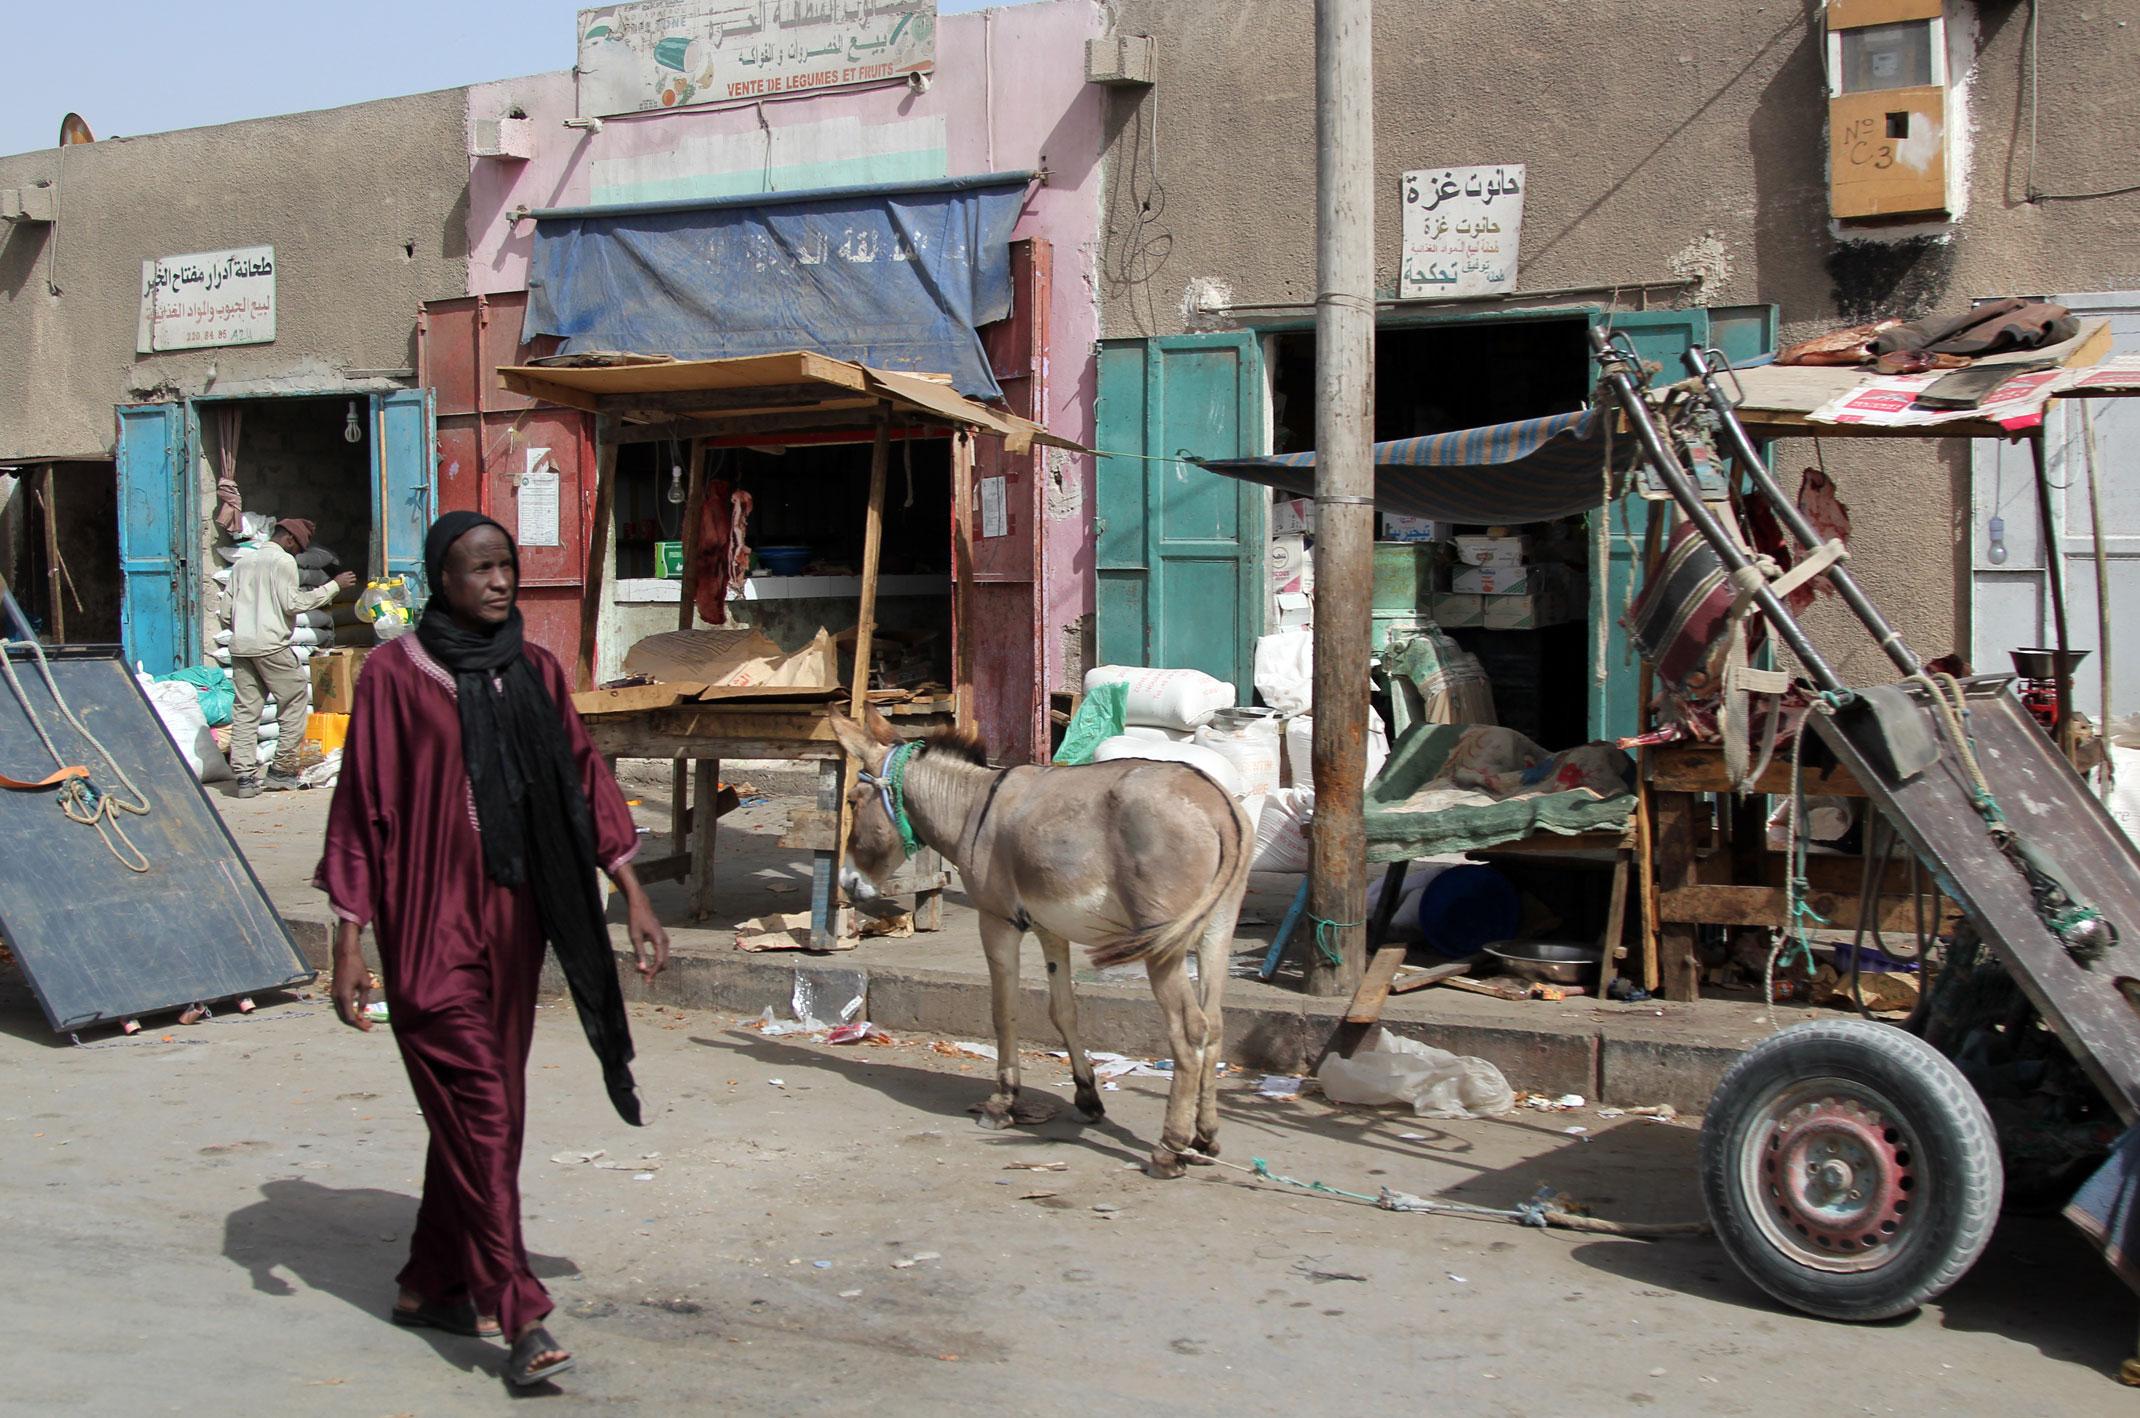 Ulice Mauretanii